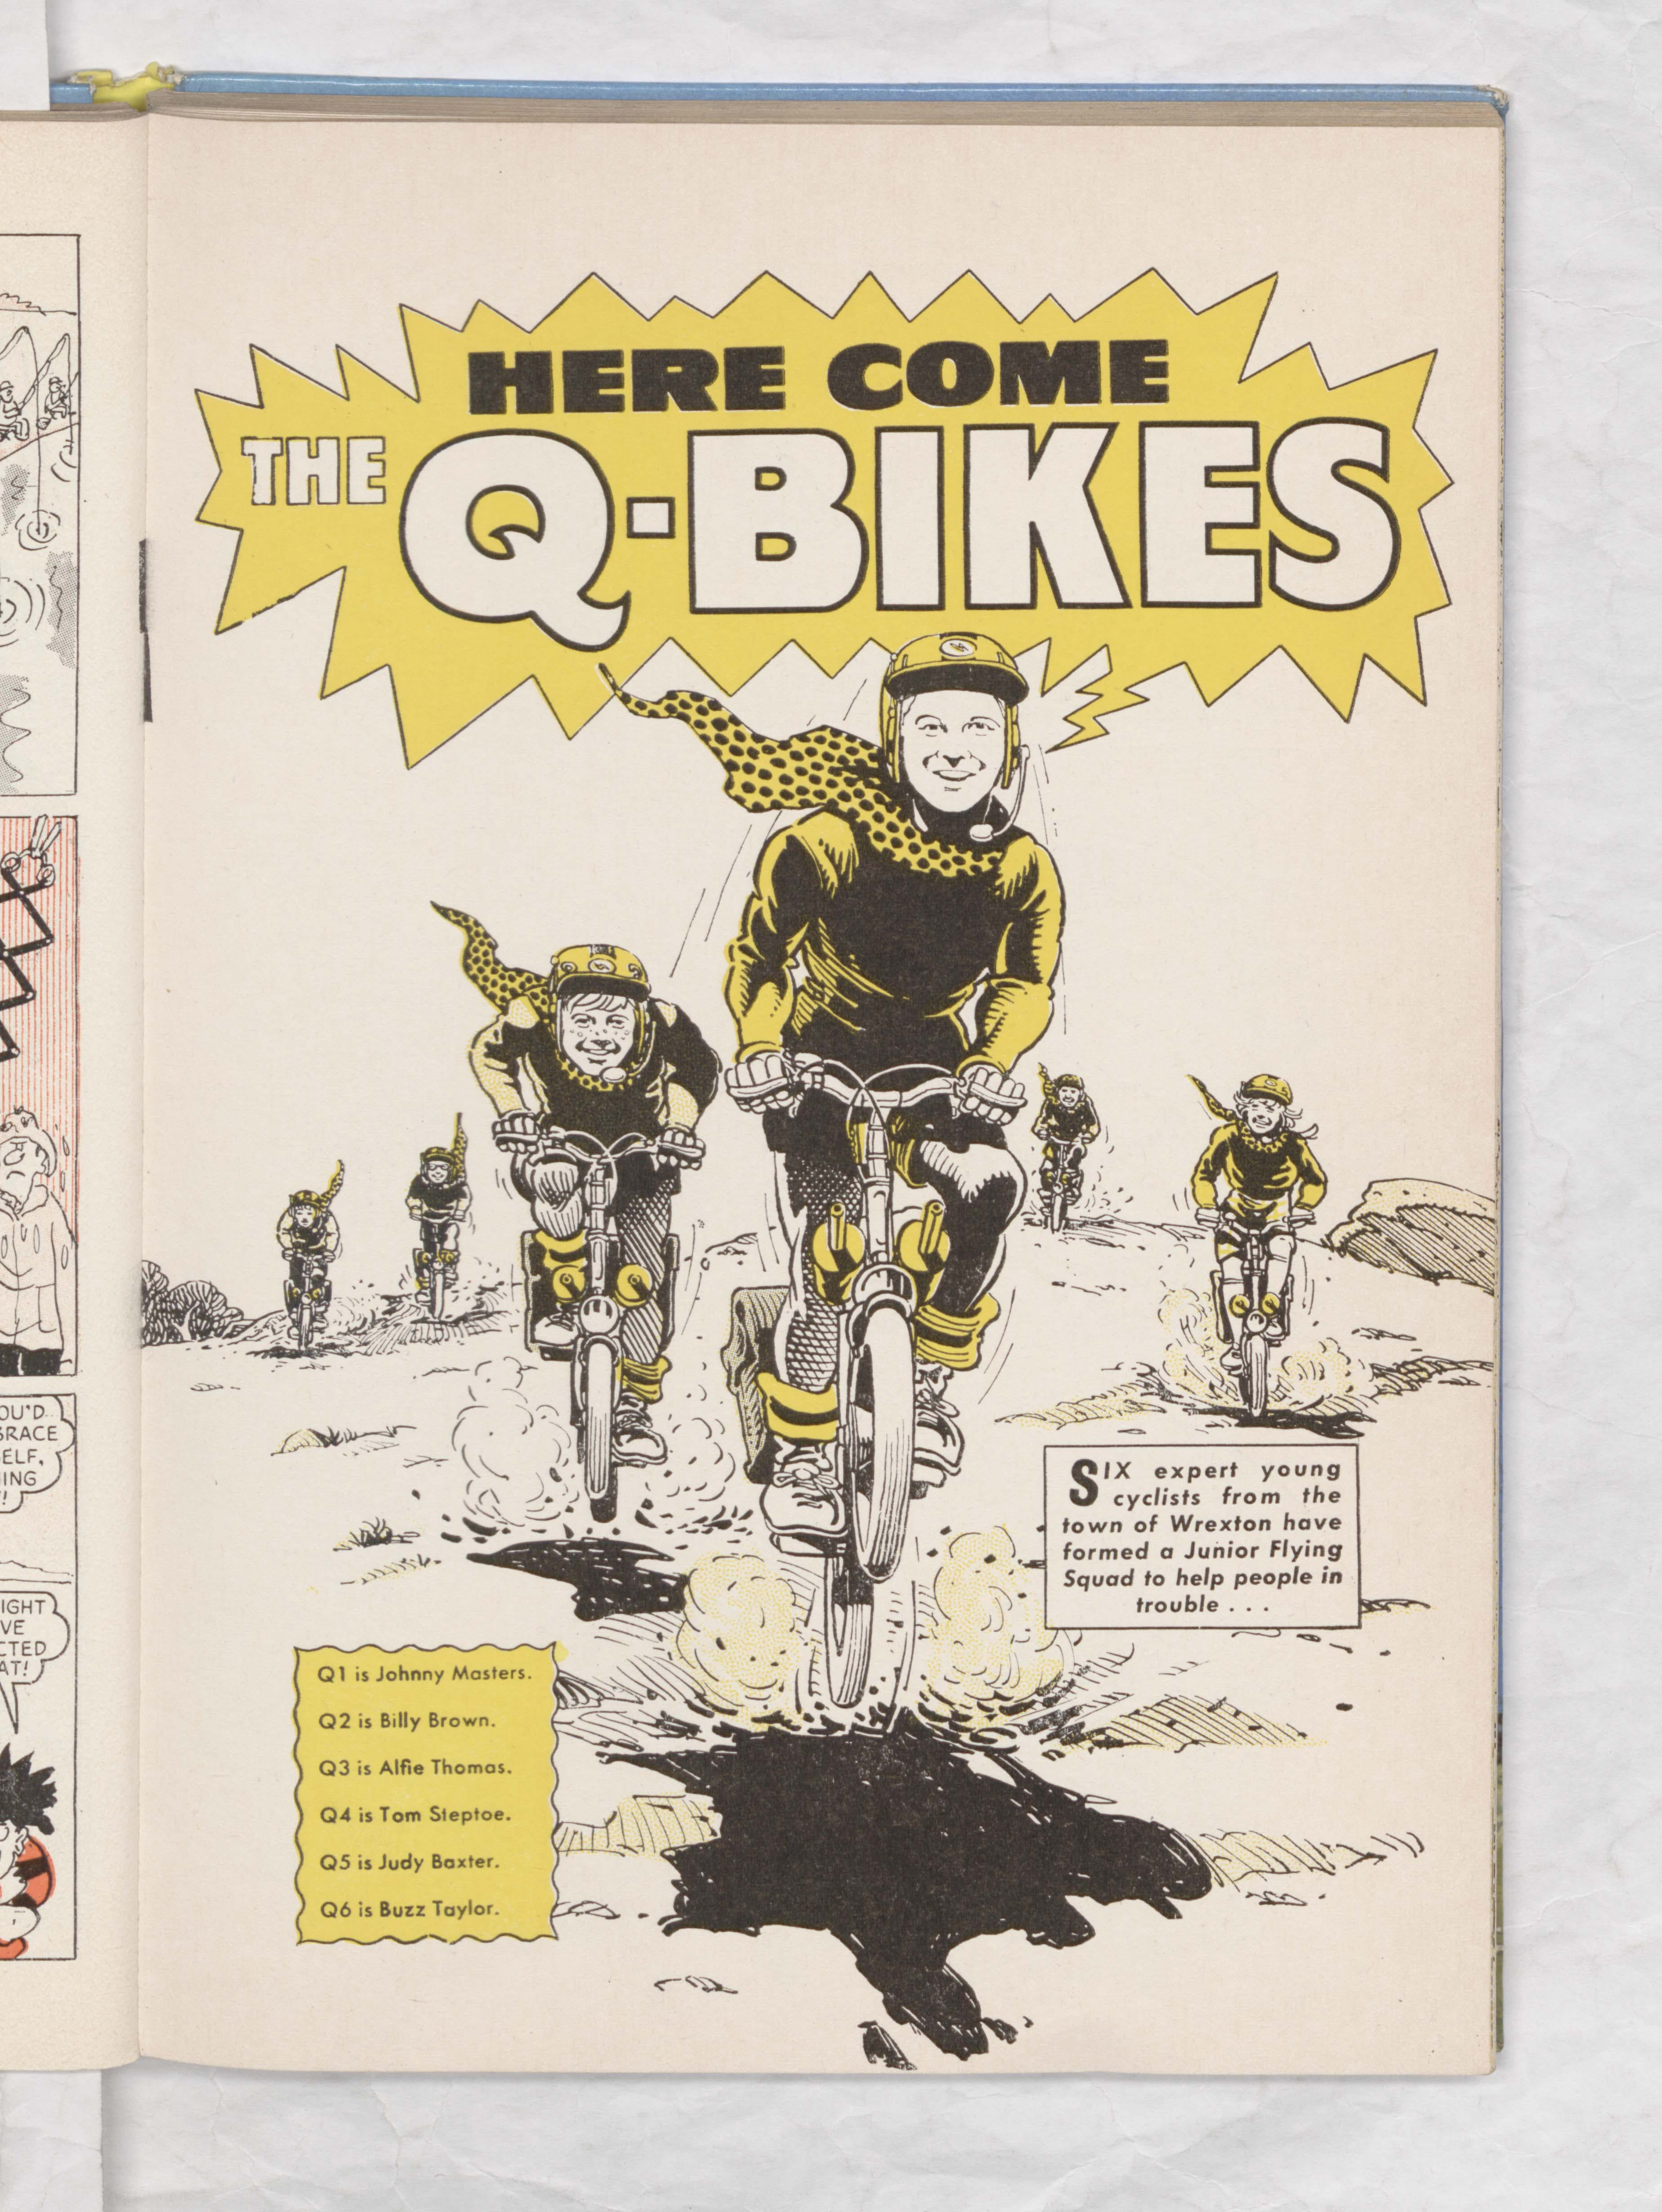 Beano Book 1970 - Q-Bikes - Page 1